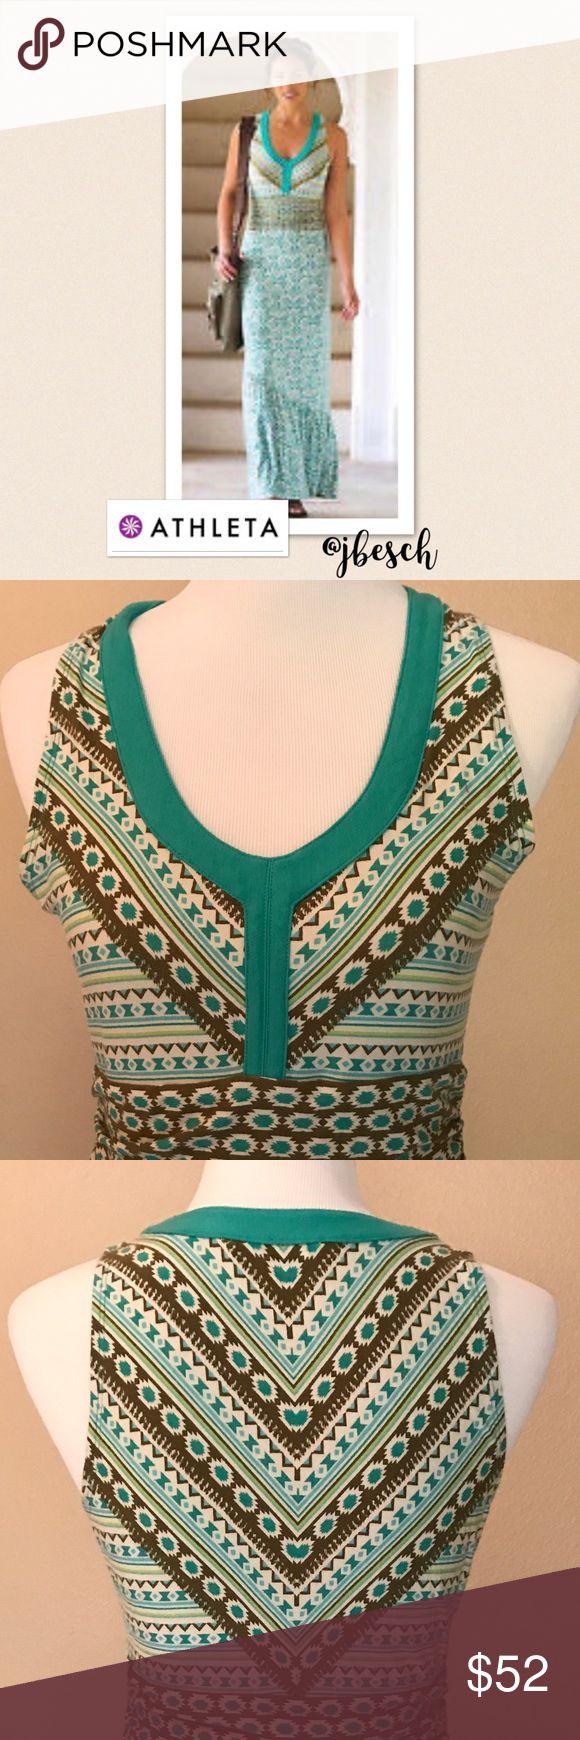 Athleta maya maxi dress